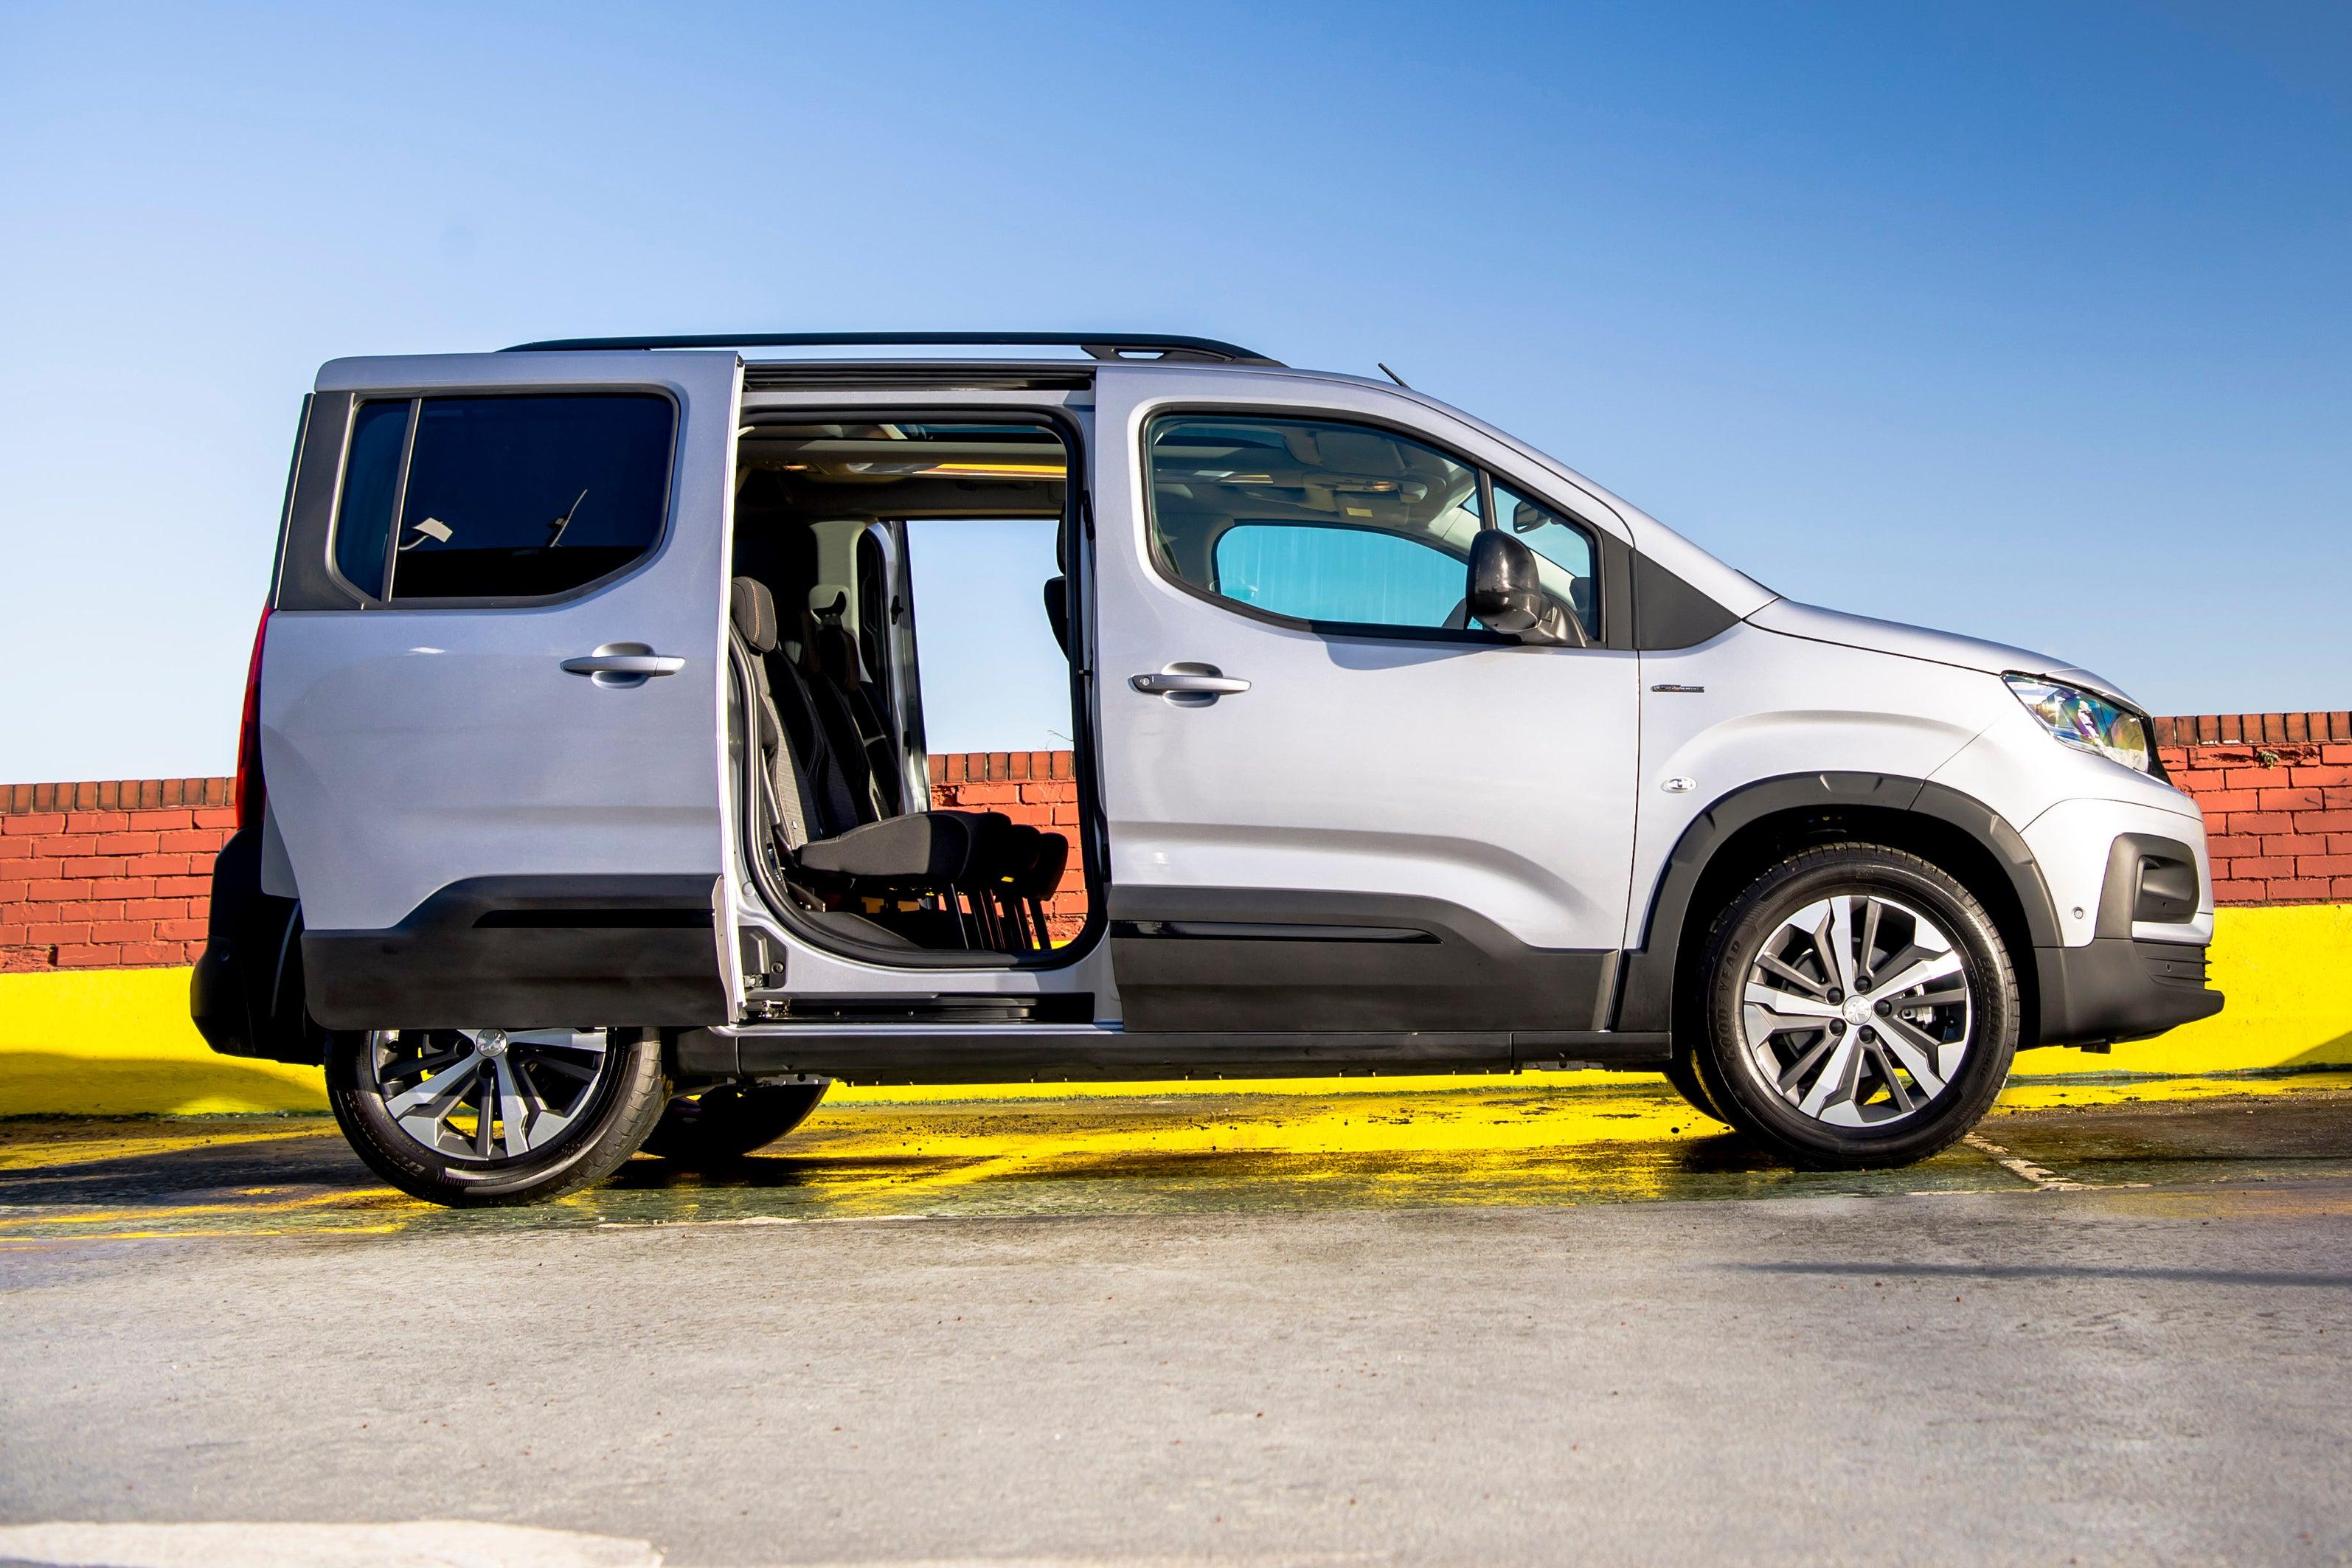 Peugeot Rifter side profile doors